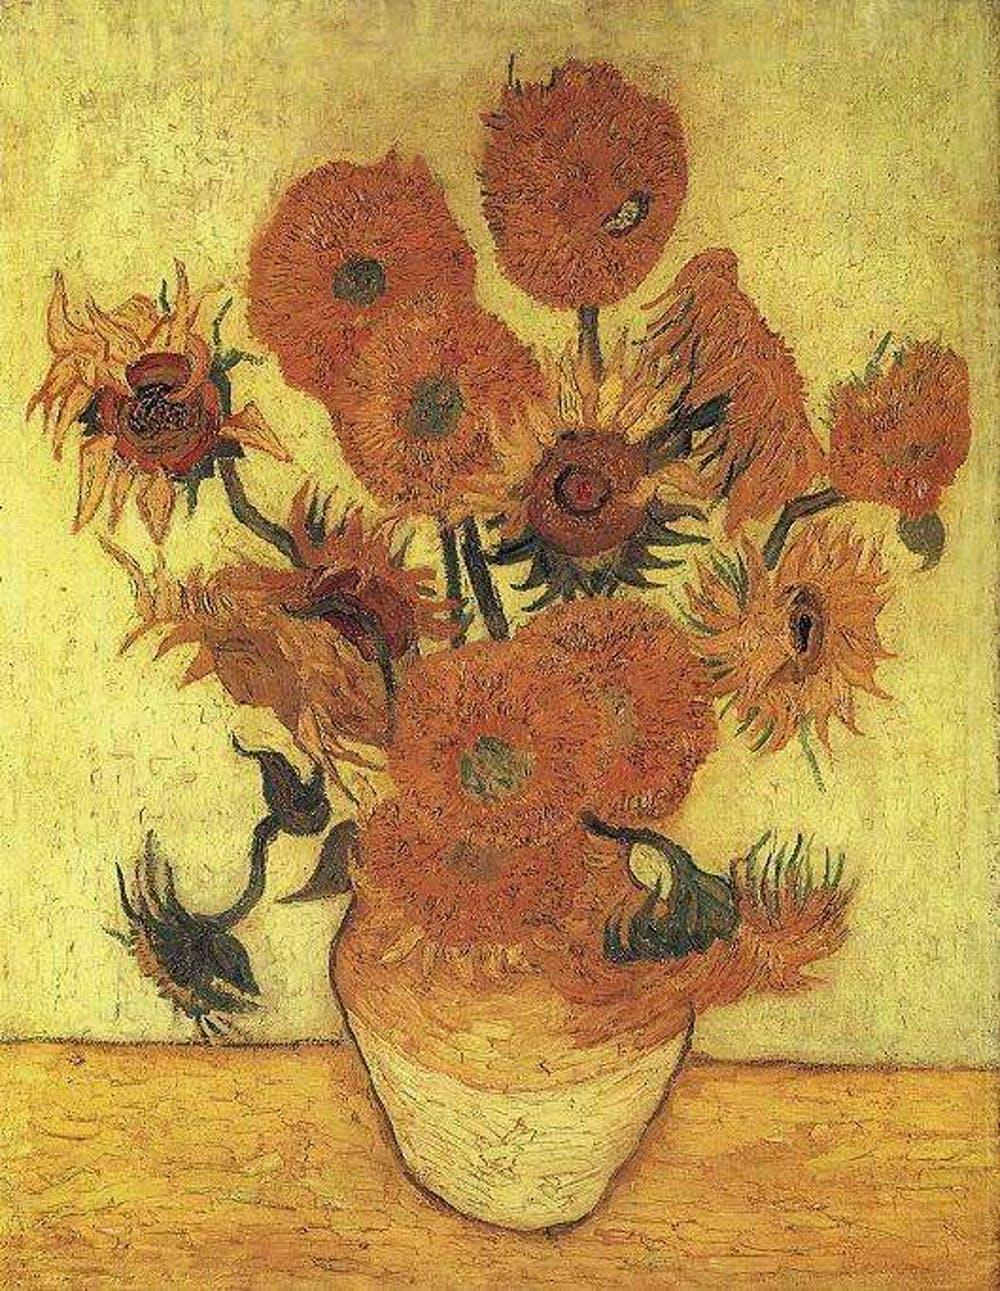 Jarrón con catorce girasoles (Vincent van Gogh,1889). Wikimedia Commons / Sompo Japan Museum of Art, Tokio, Japón.